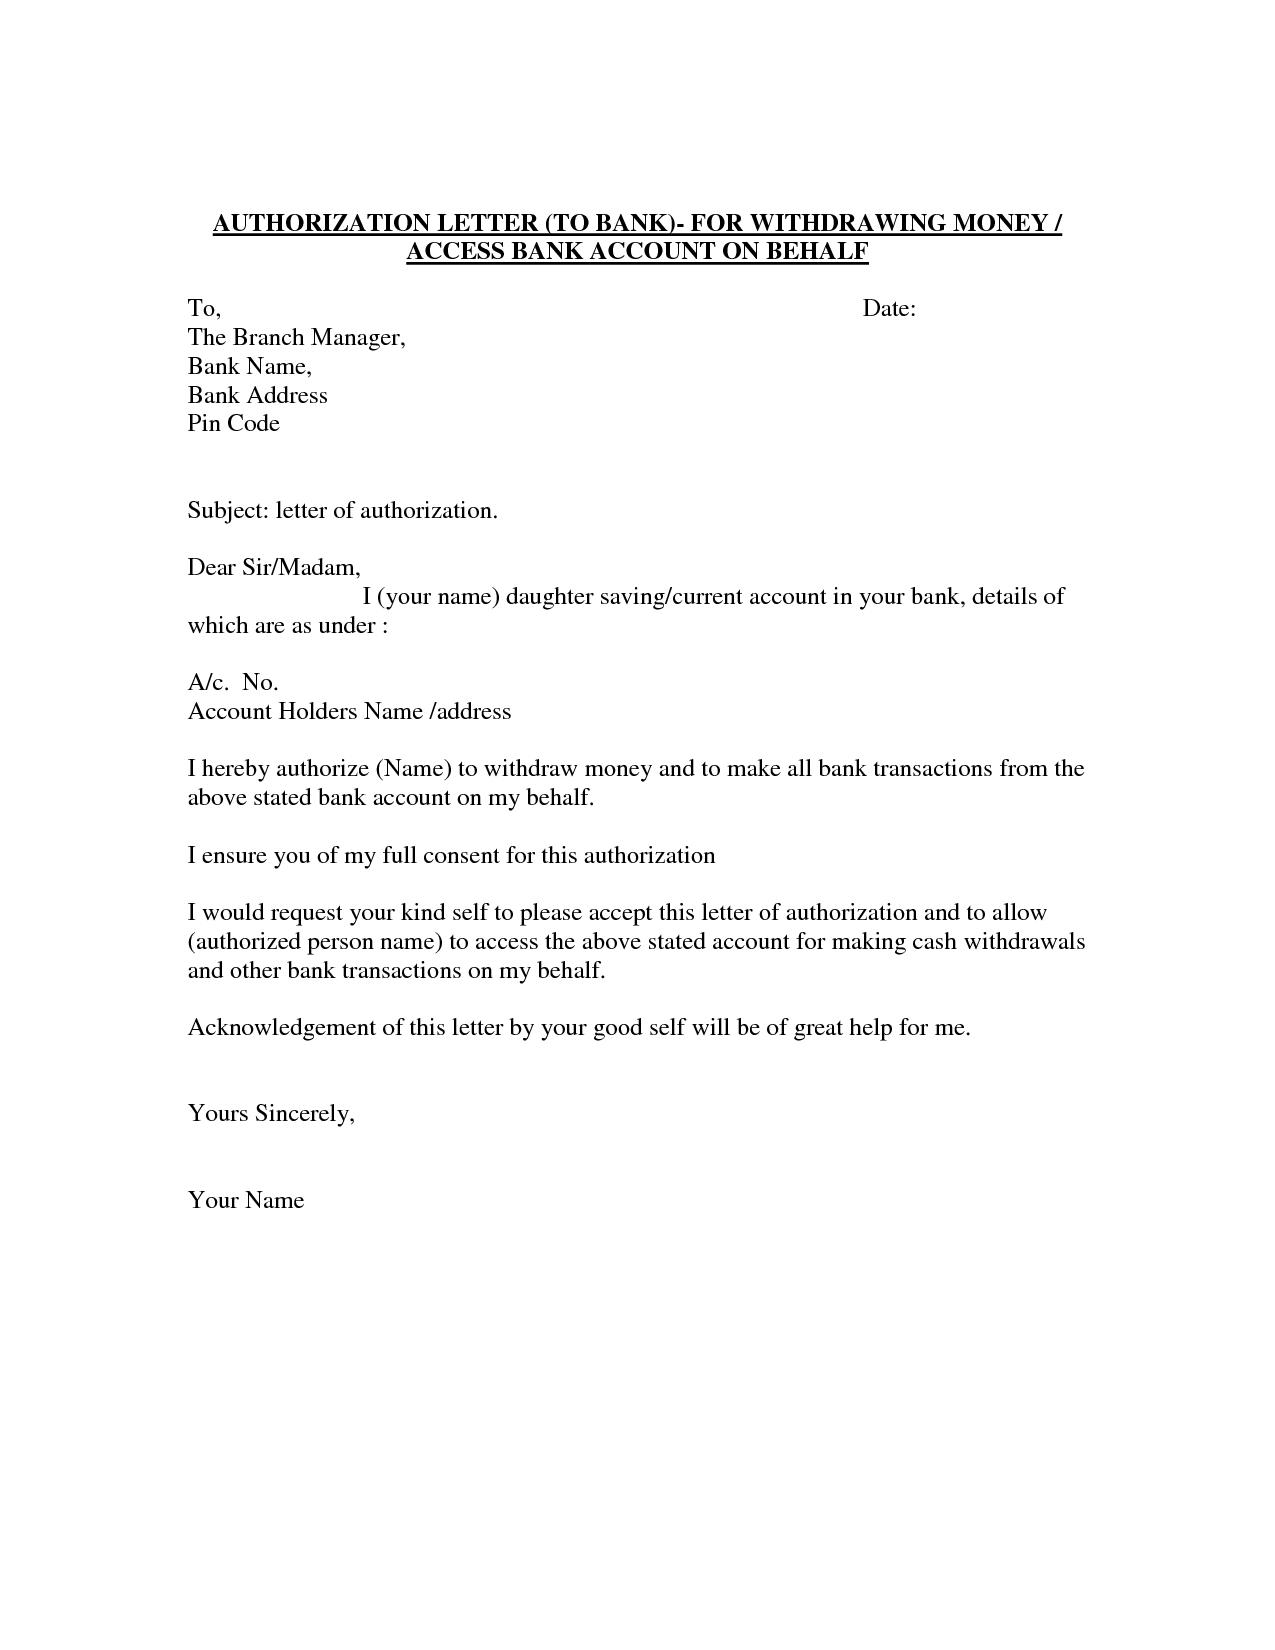 Demand Letter Template - Authorization Letter Template Best Car Galleryformal Letter Template